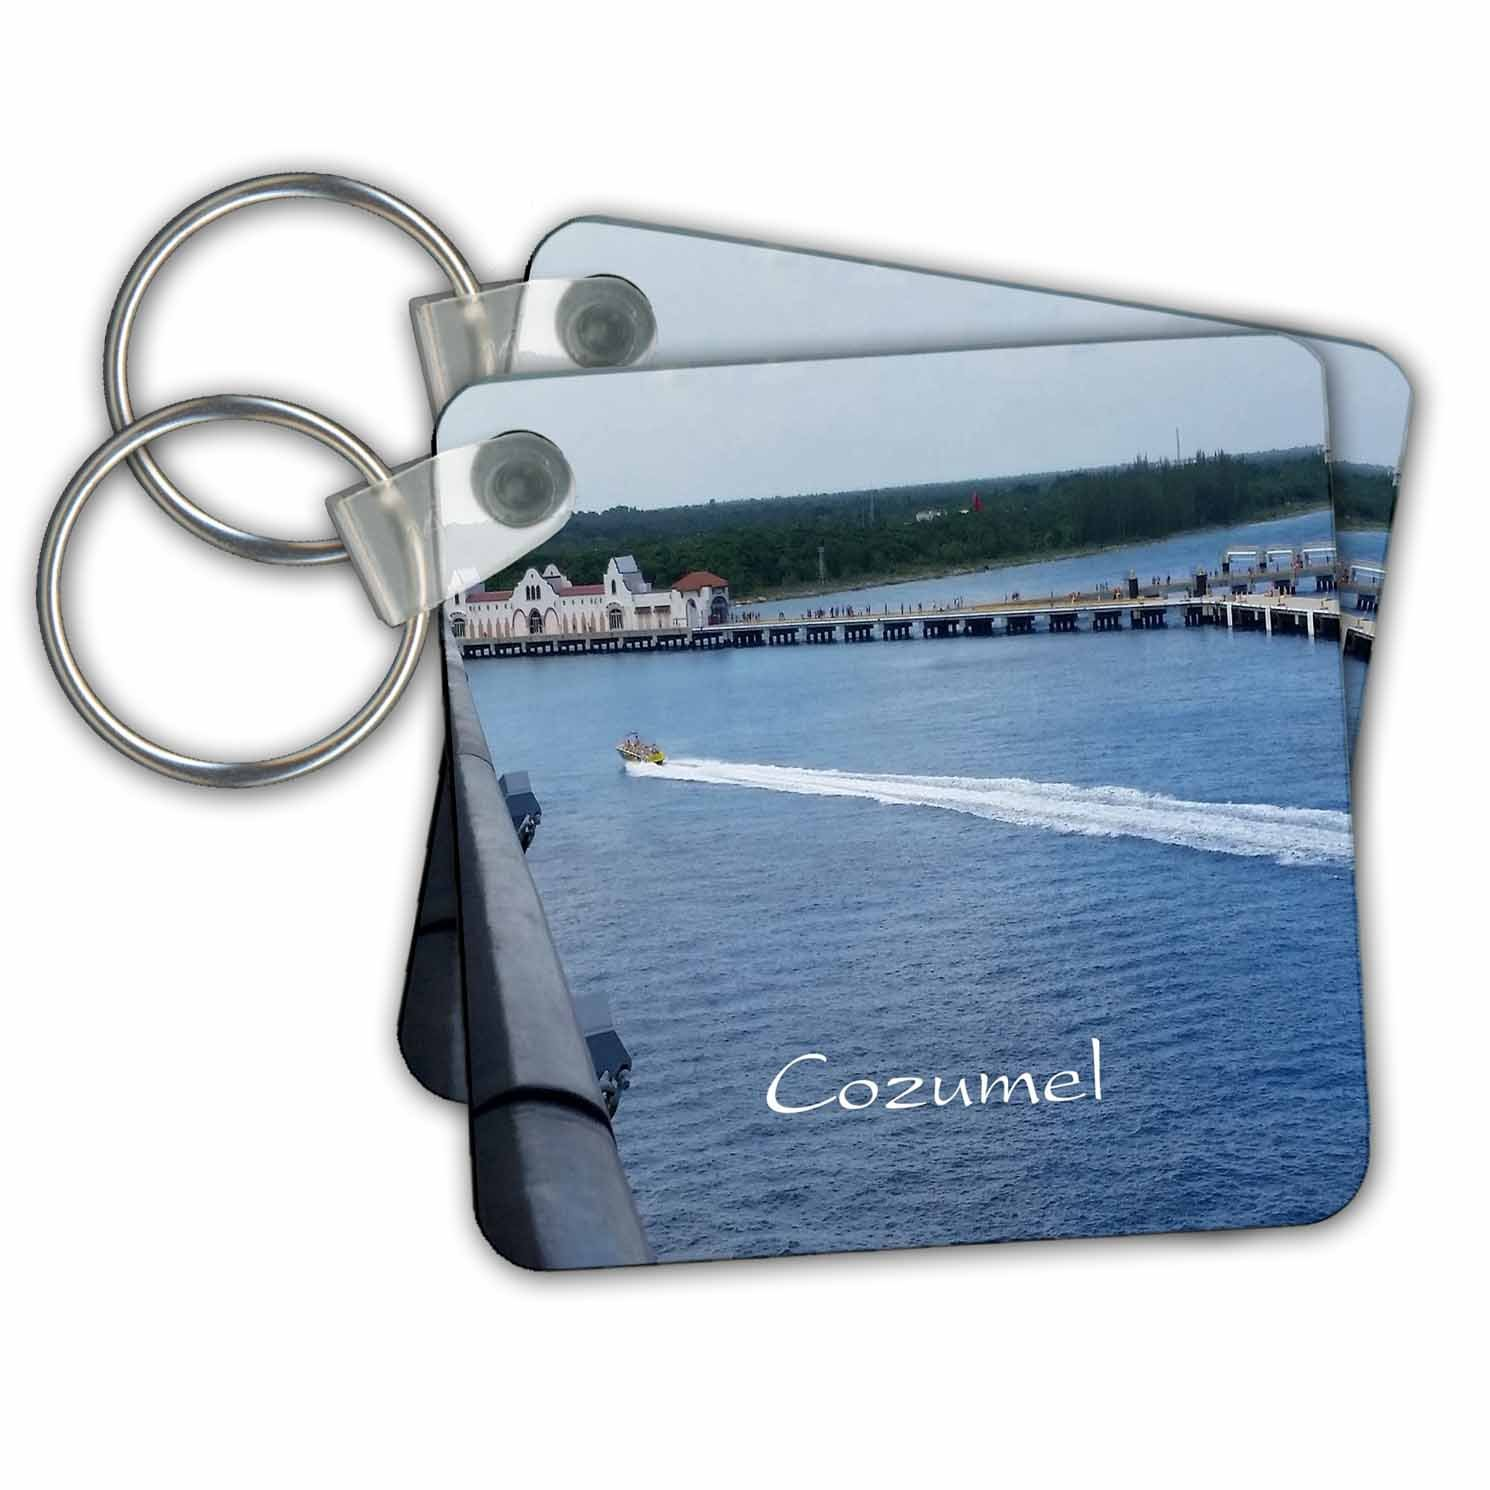 3dRose Image of Entering Cozumel Mexico Port - Key Chains, 2.25'' x 2.25'', Set of 2 (kc_253687_1)